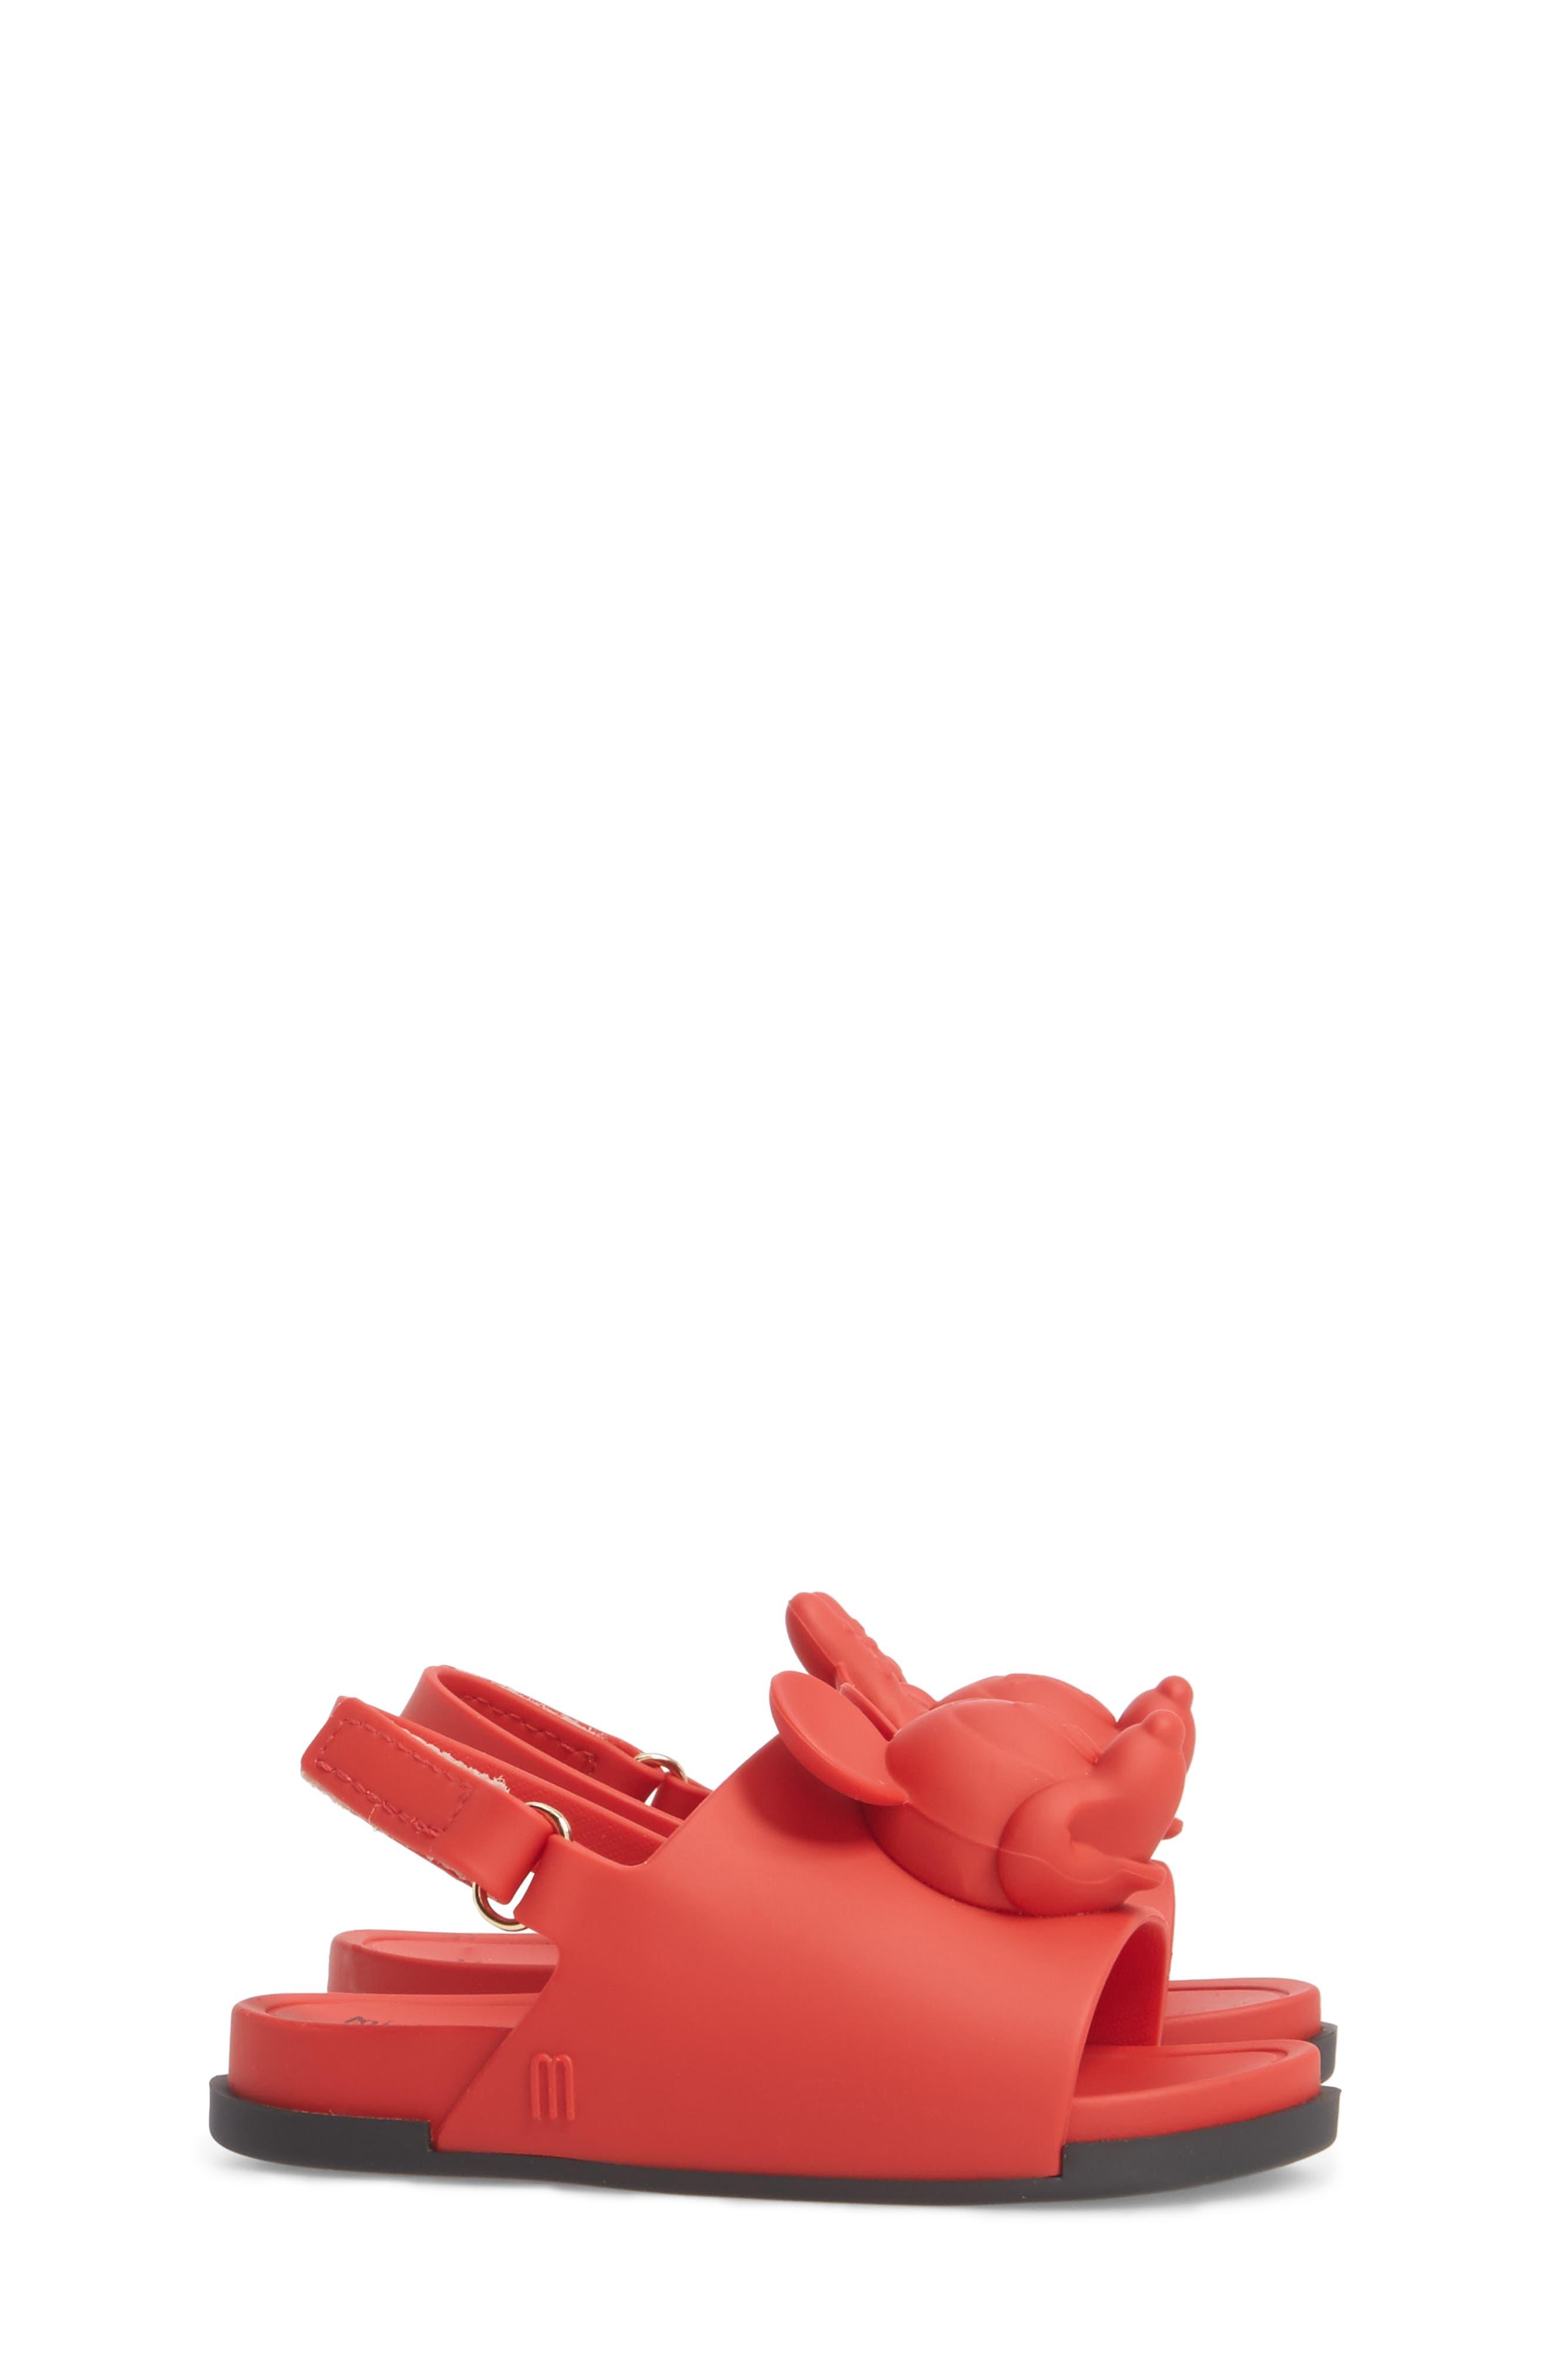 Disney<sup>®</sup> Mini Beach Sandal,                             Alternate thumbnail 15, color,